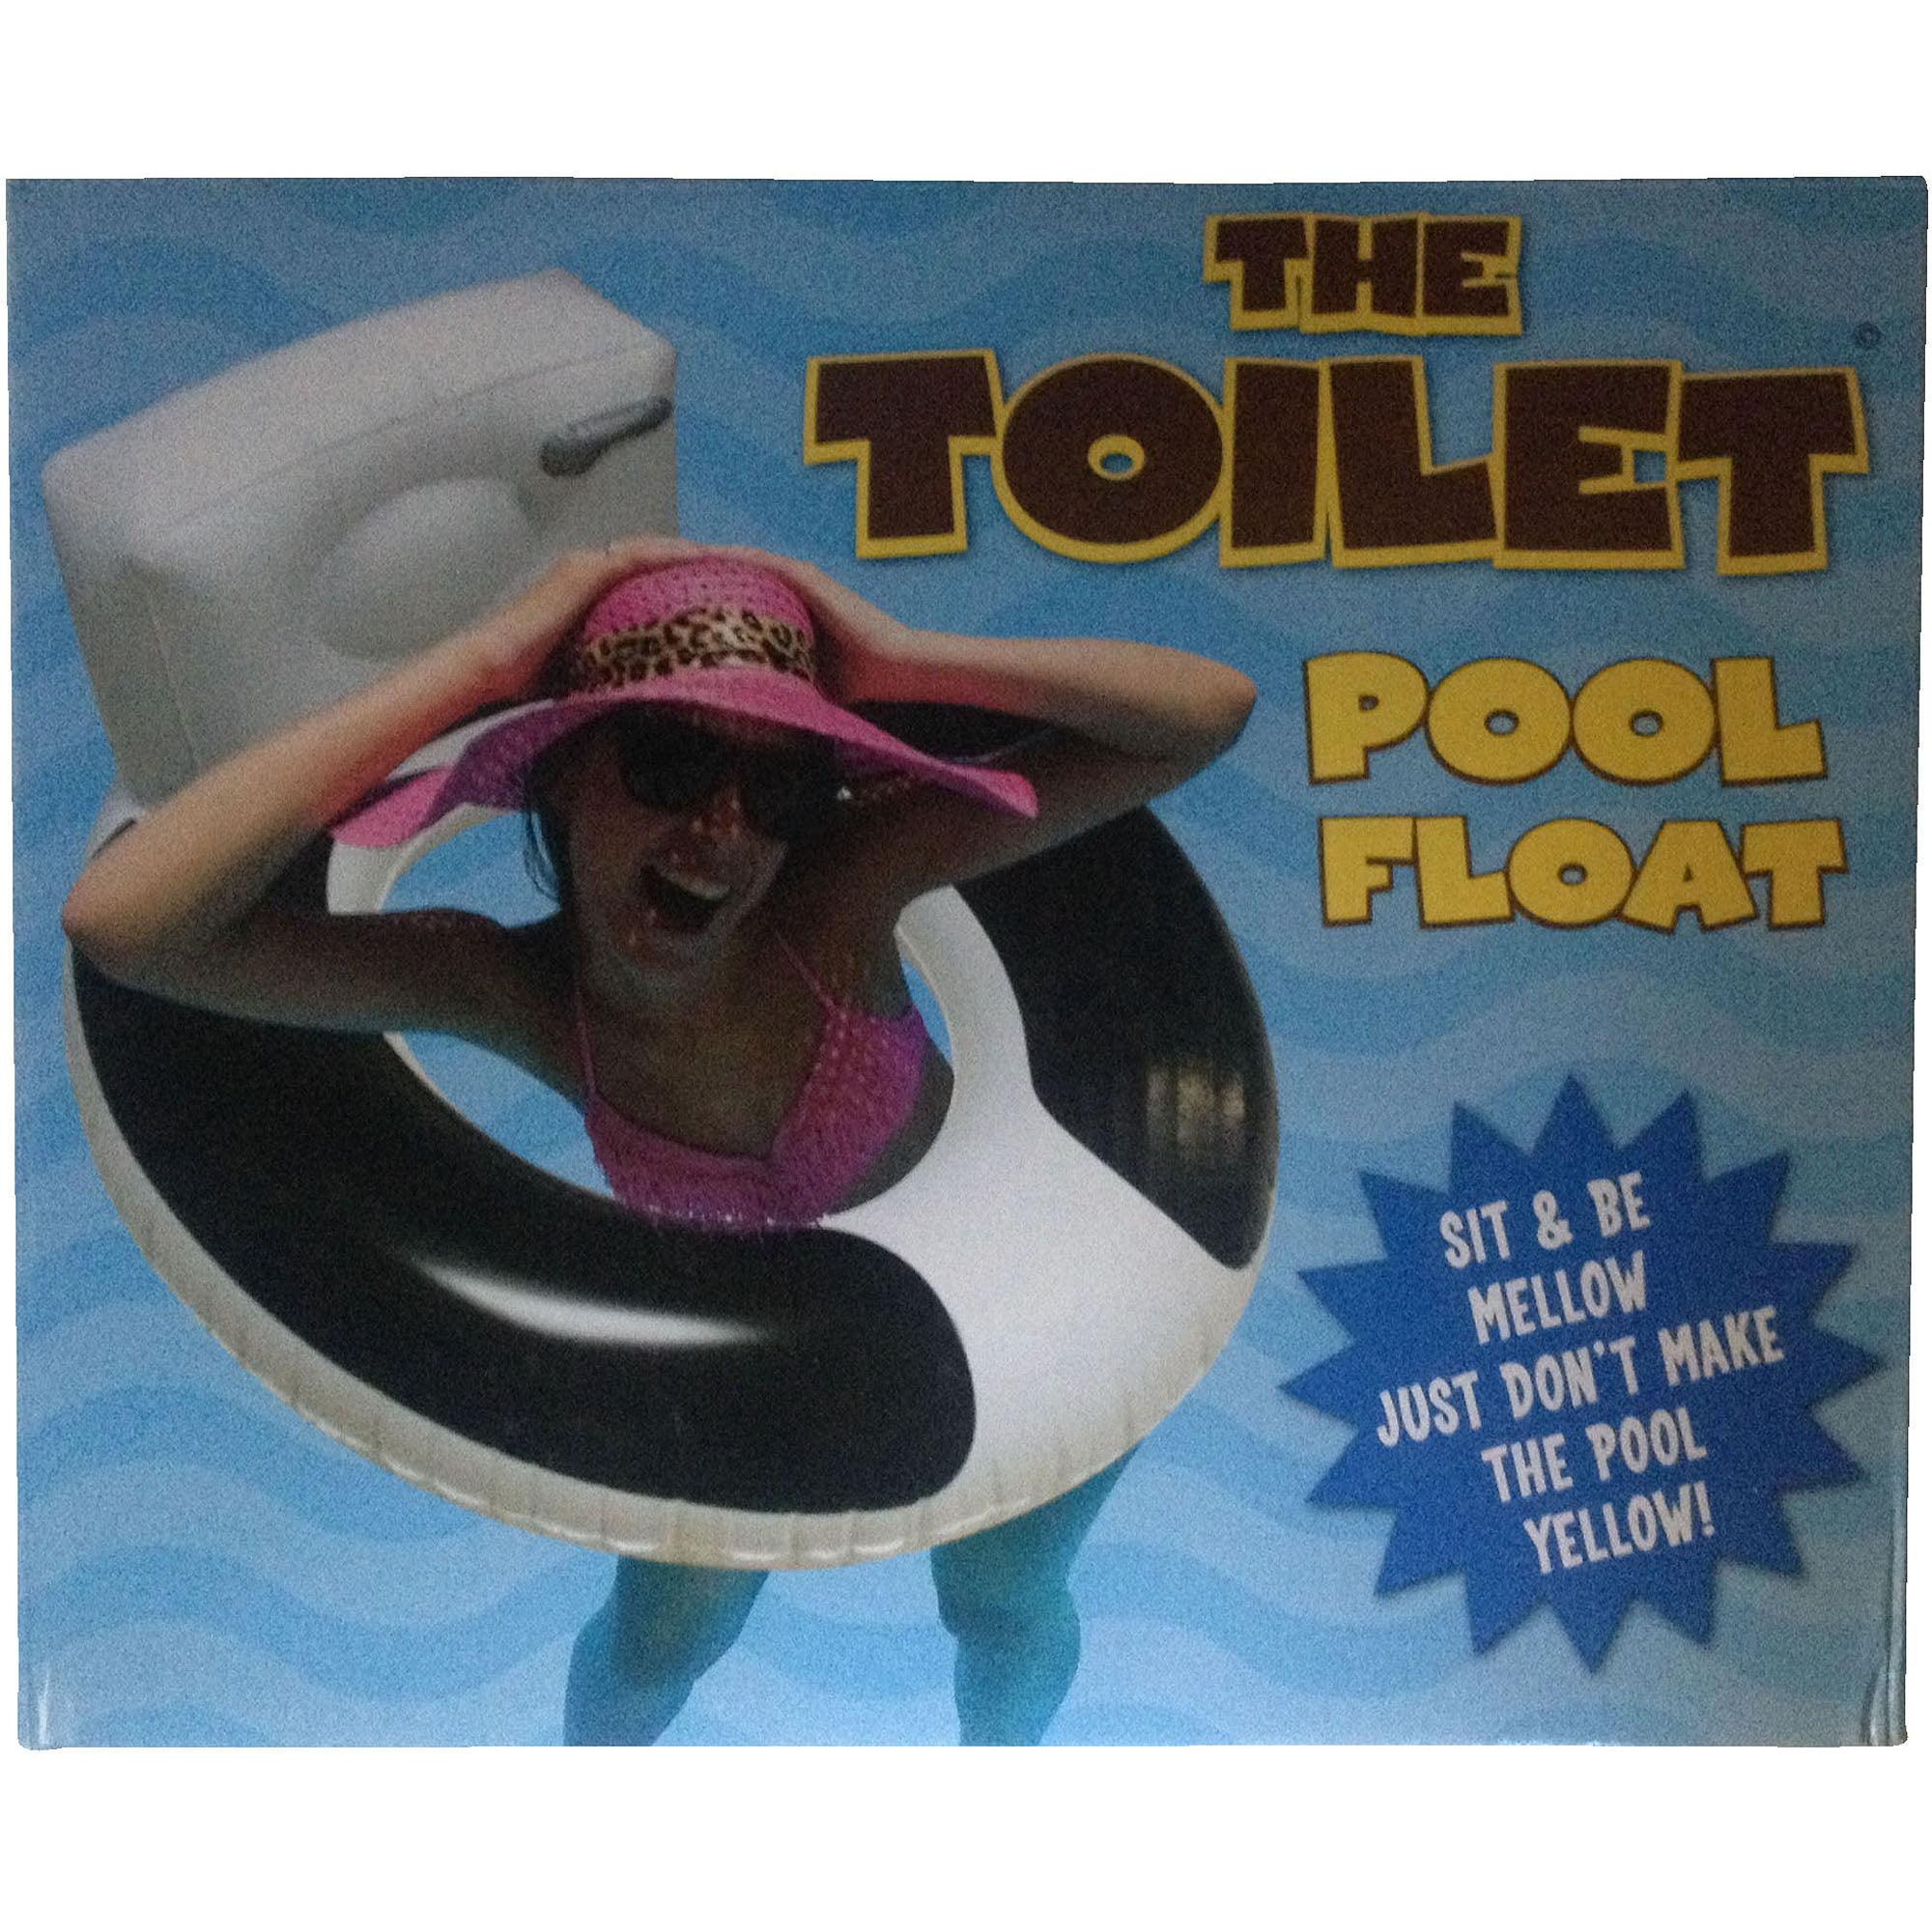 Toilet Pool Float